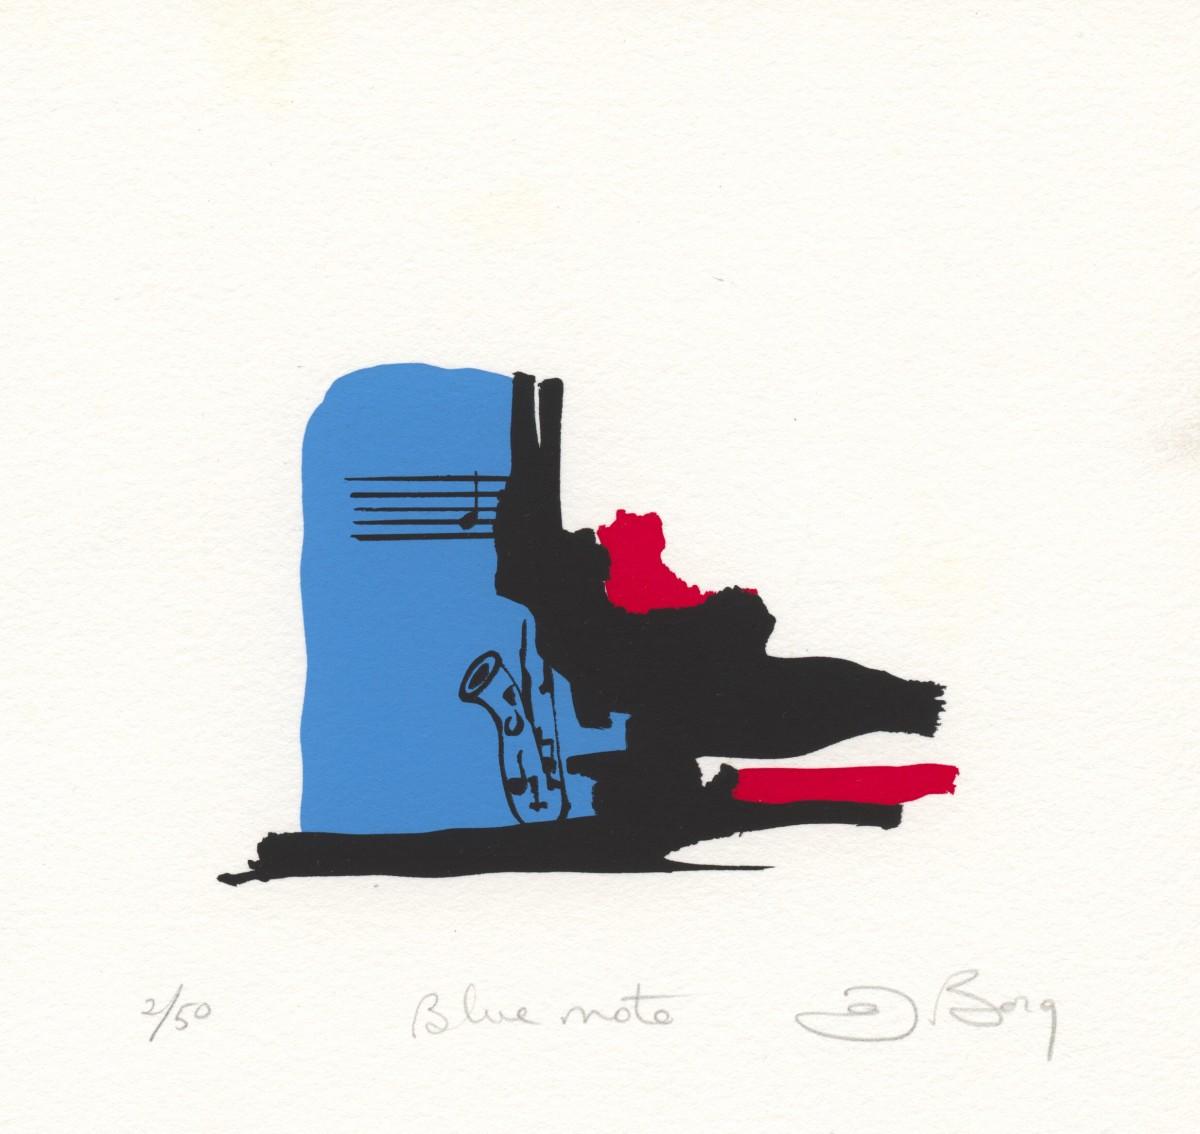 Blue Note by Joe Borg